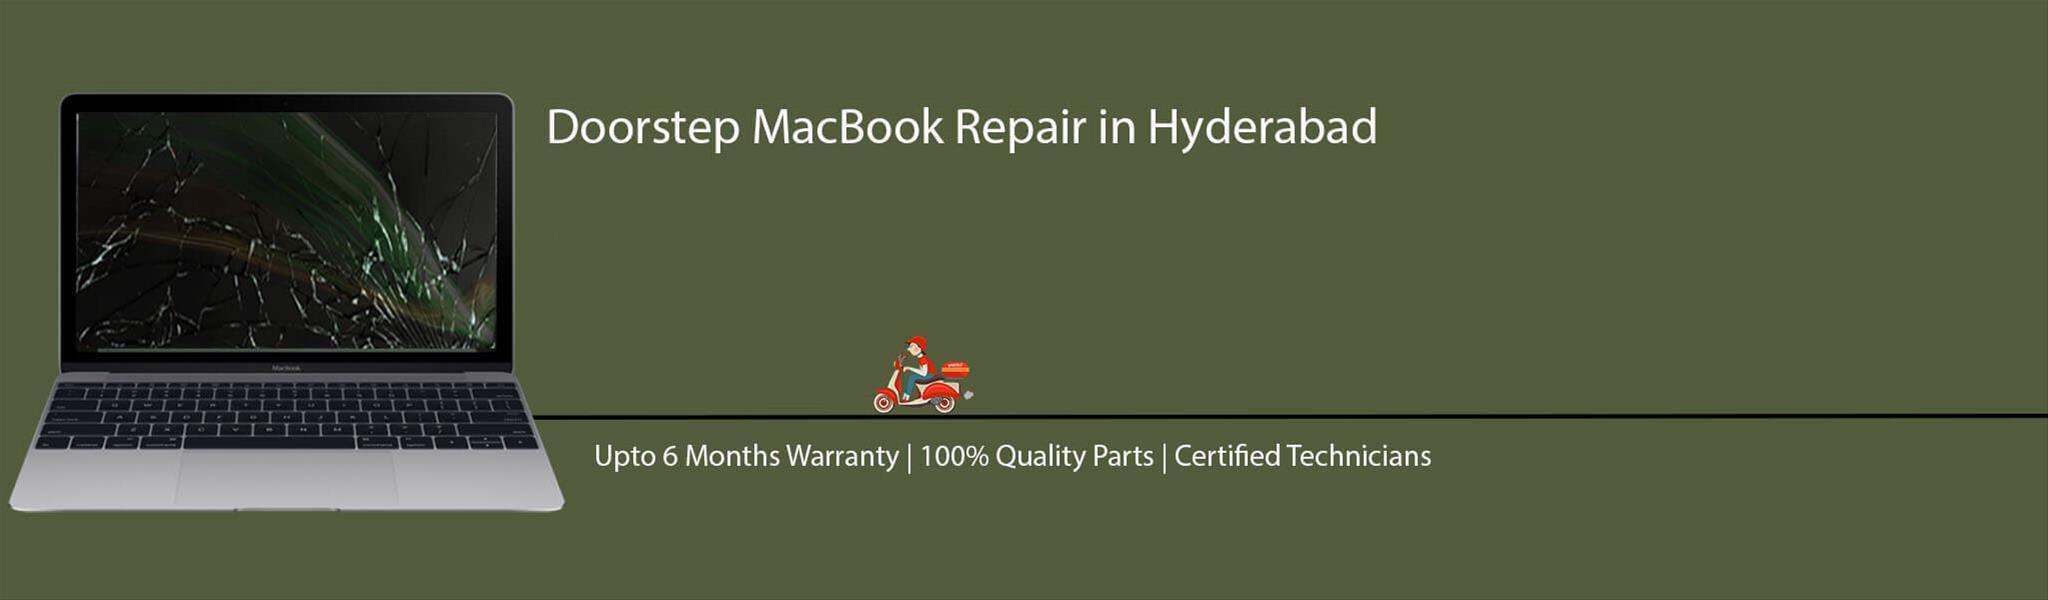 macbook-laptop-banner-hyderabad.jpg